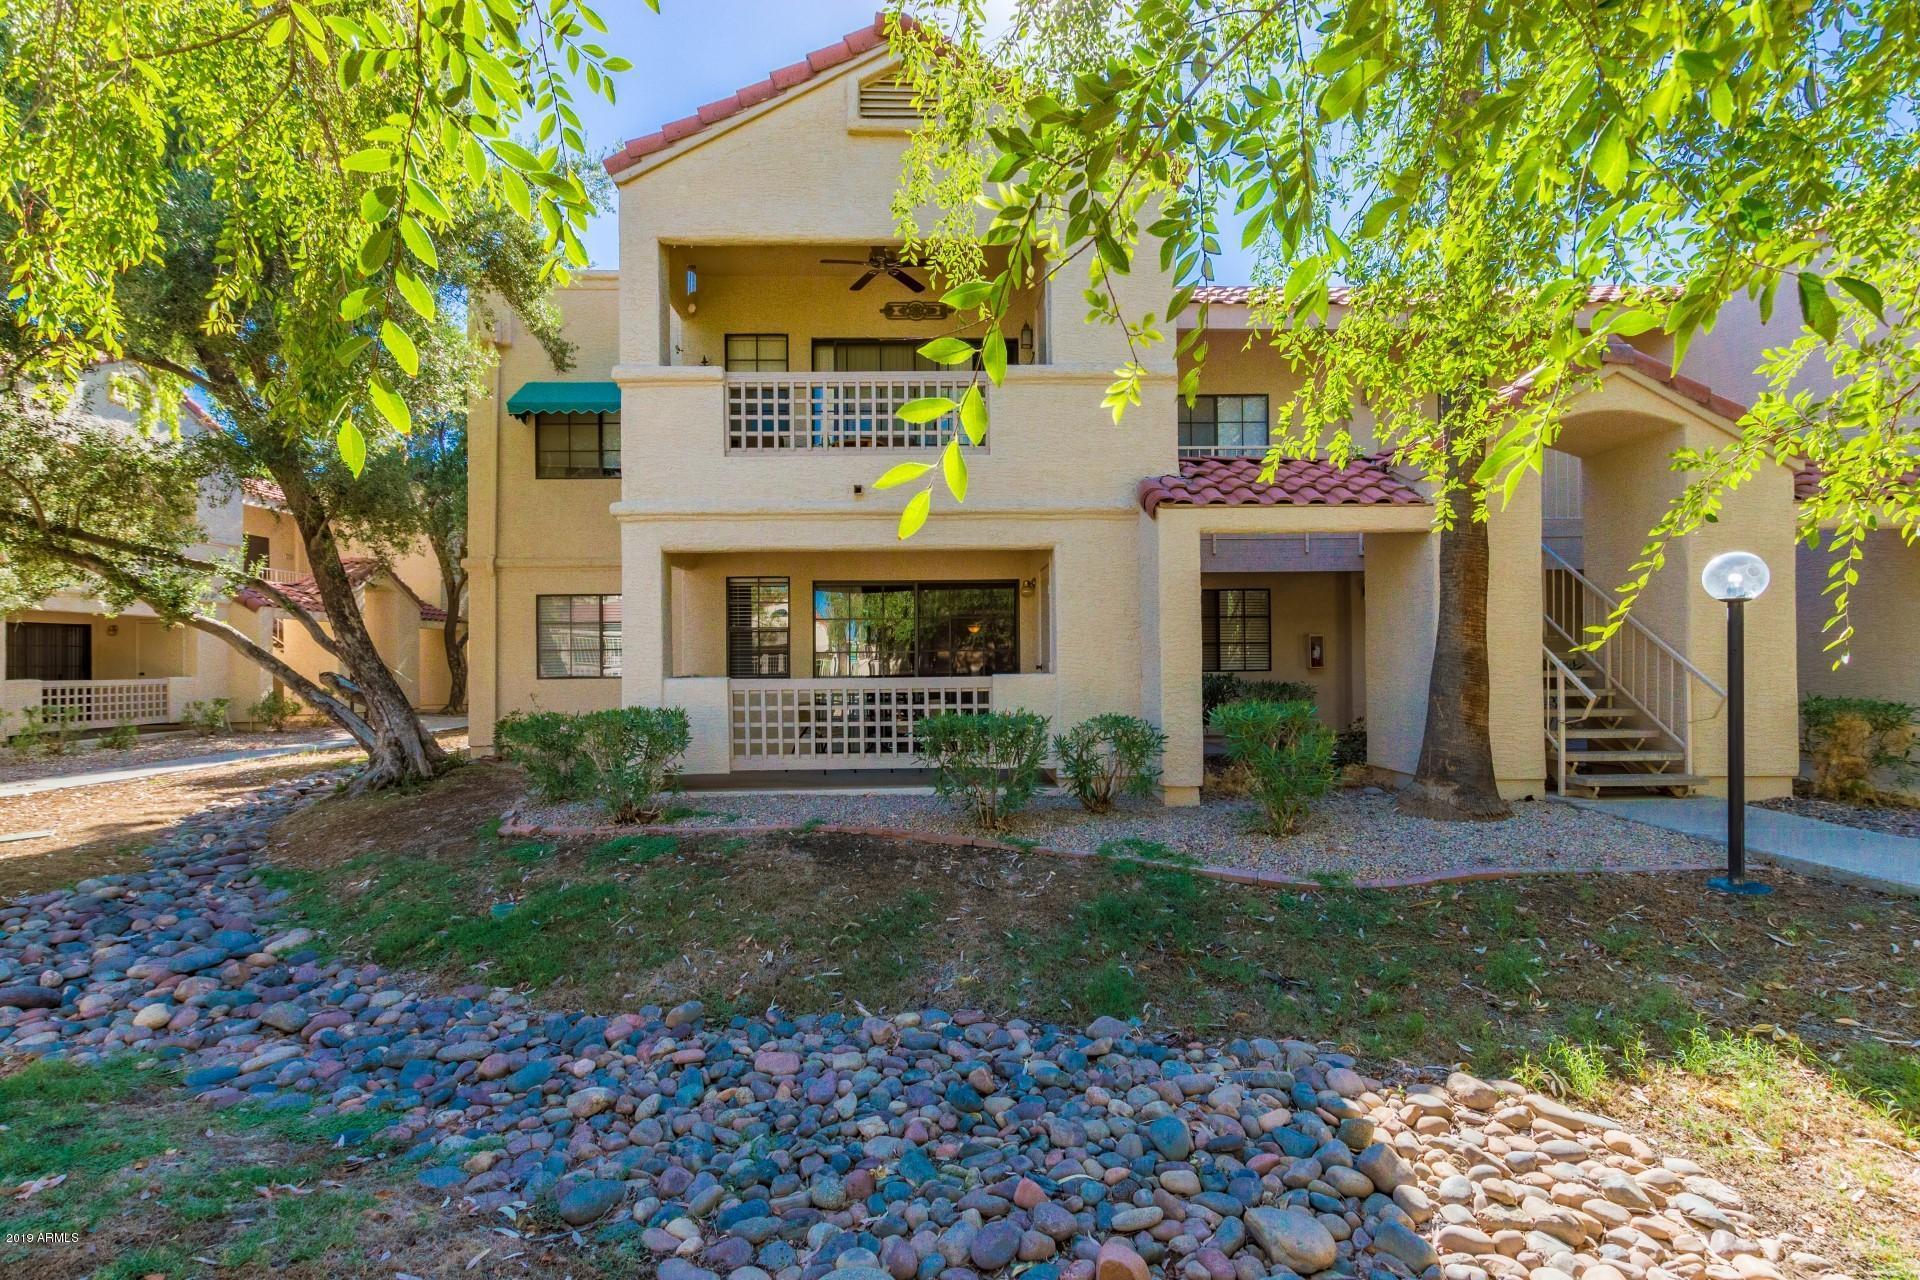 Photo of 2855 S EXTENSION Road #117, Mesa, AZ 85210